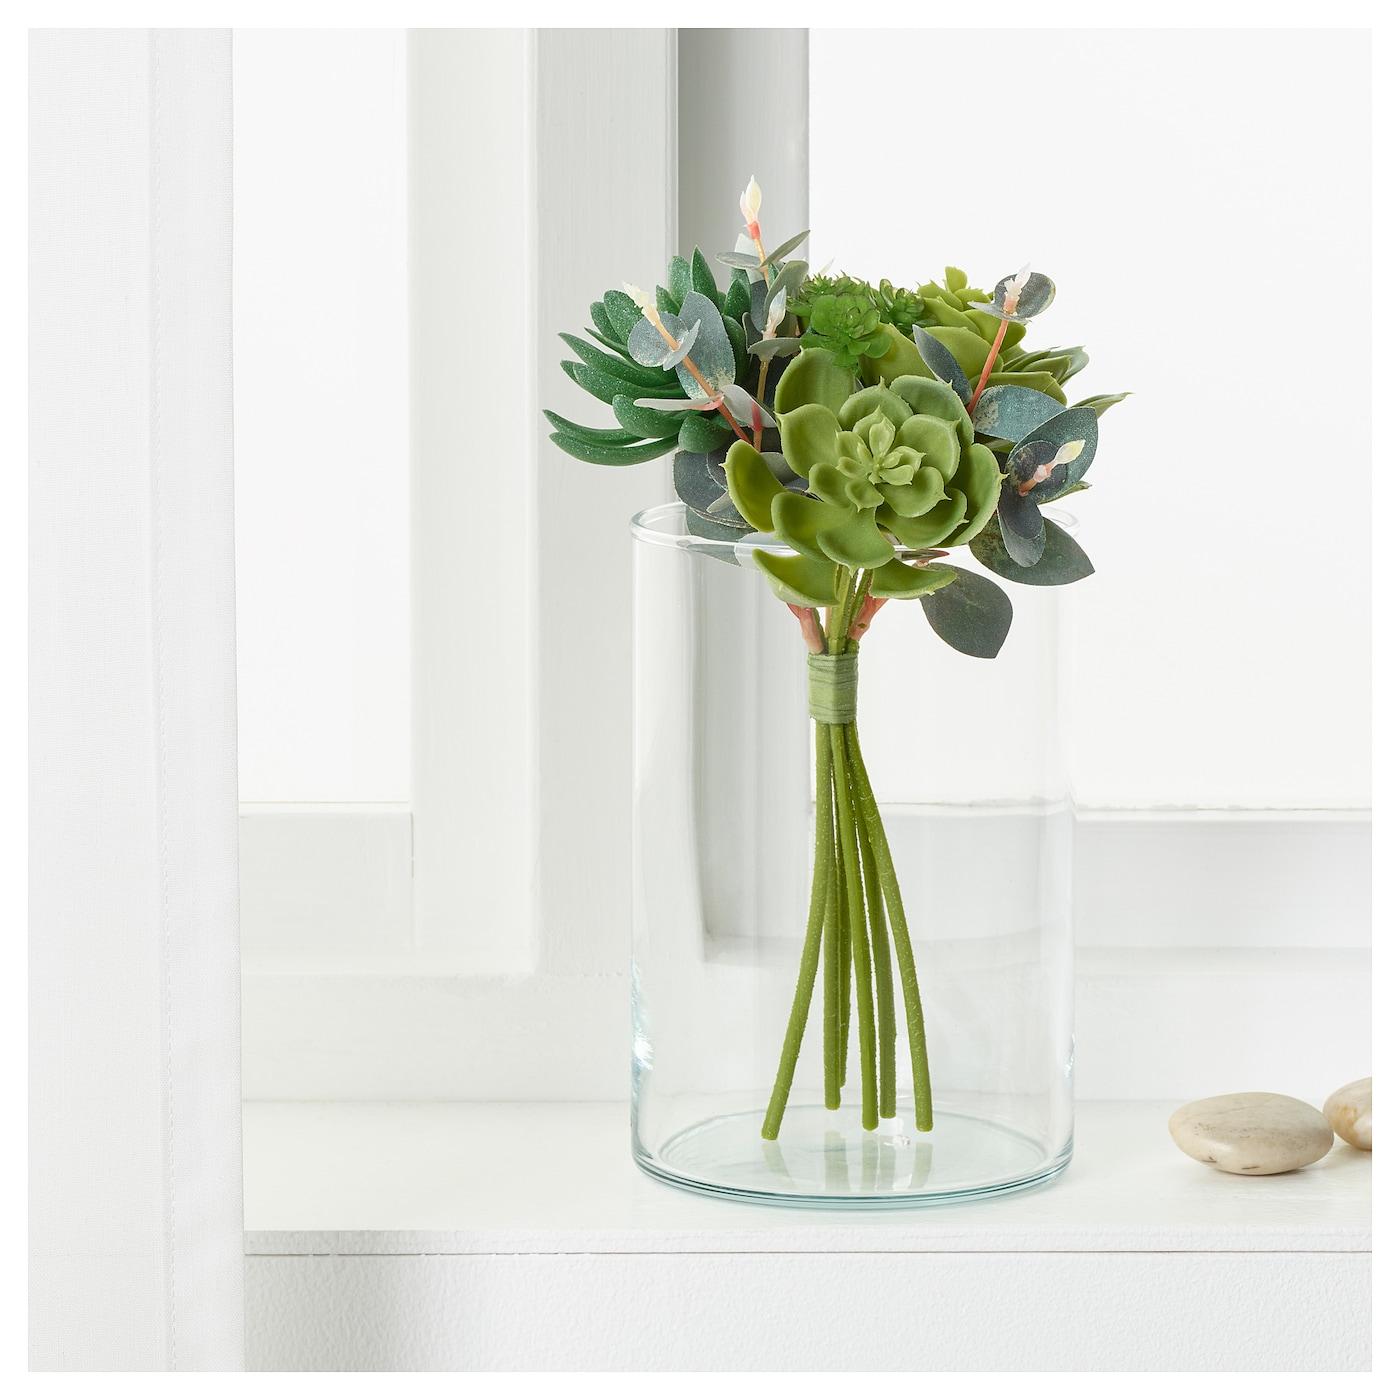 smycka bouquet artificiel succulente vert 24 cm ikea. Black Bedroom Furniture Sets. Home Design Ideas